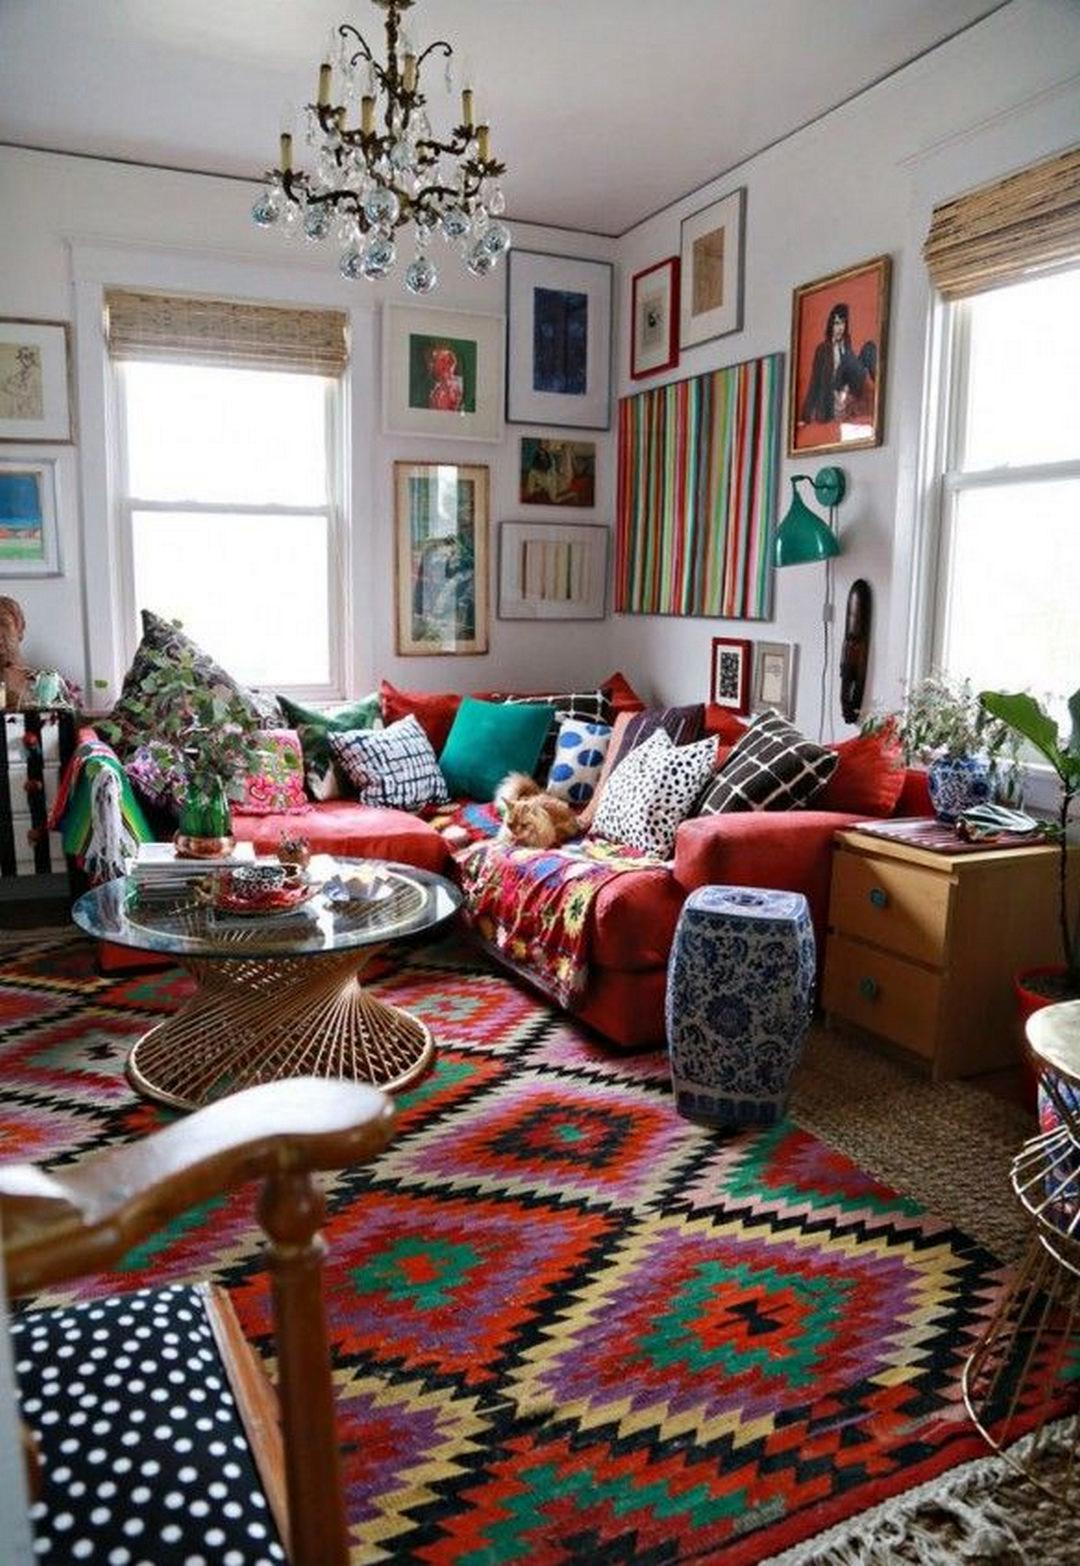 Decorating A Room Online: Stunning Maximalist Decor Idea (7)